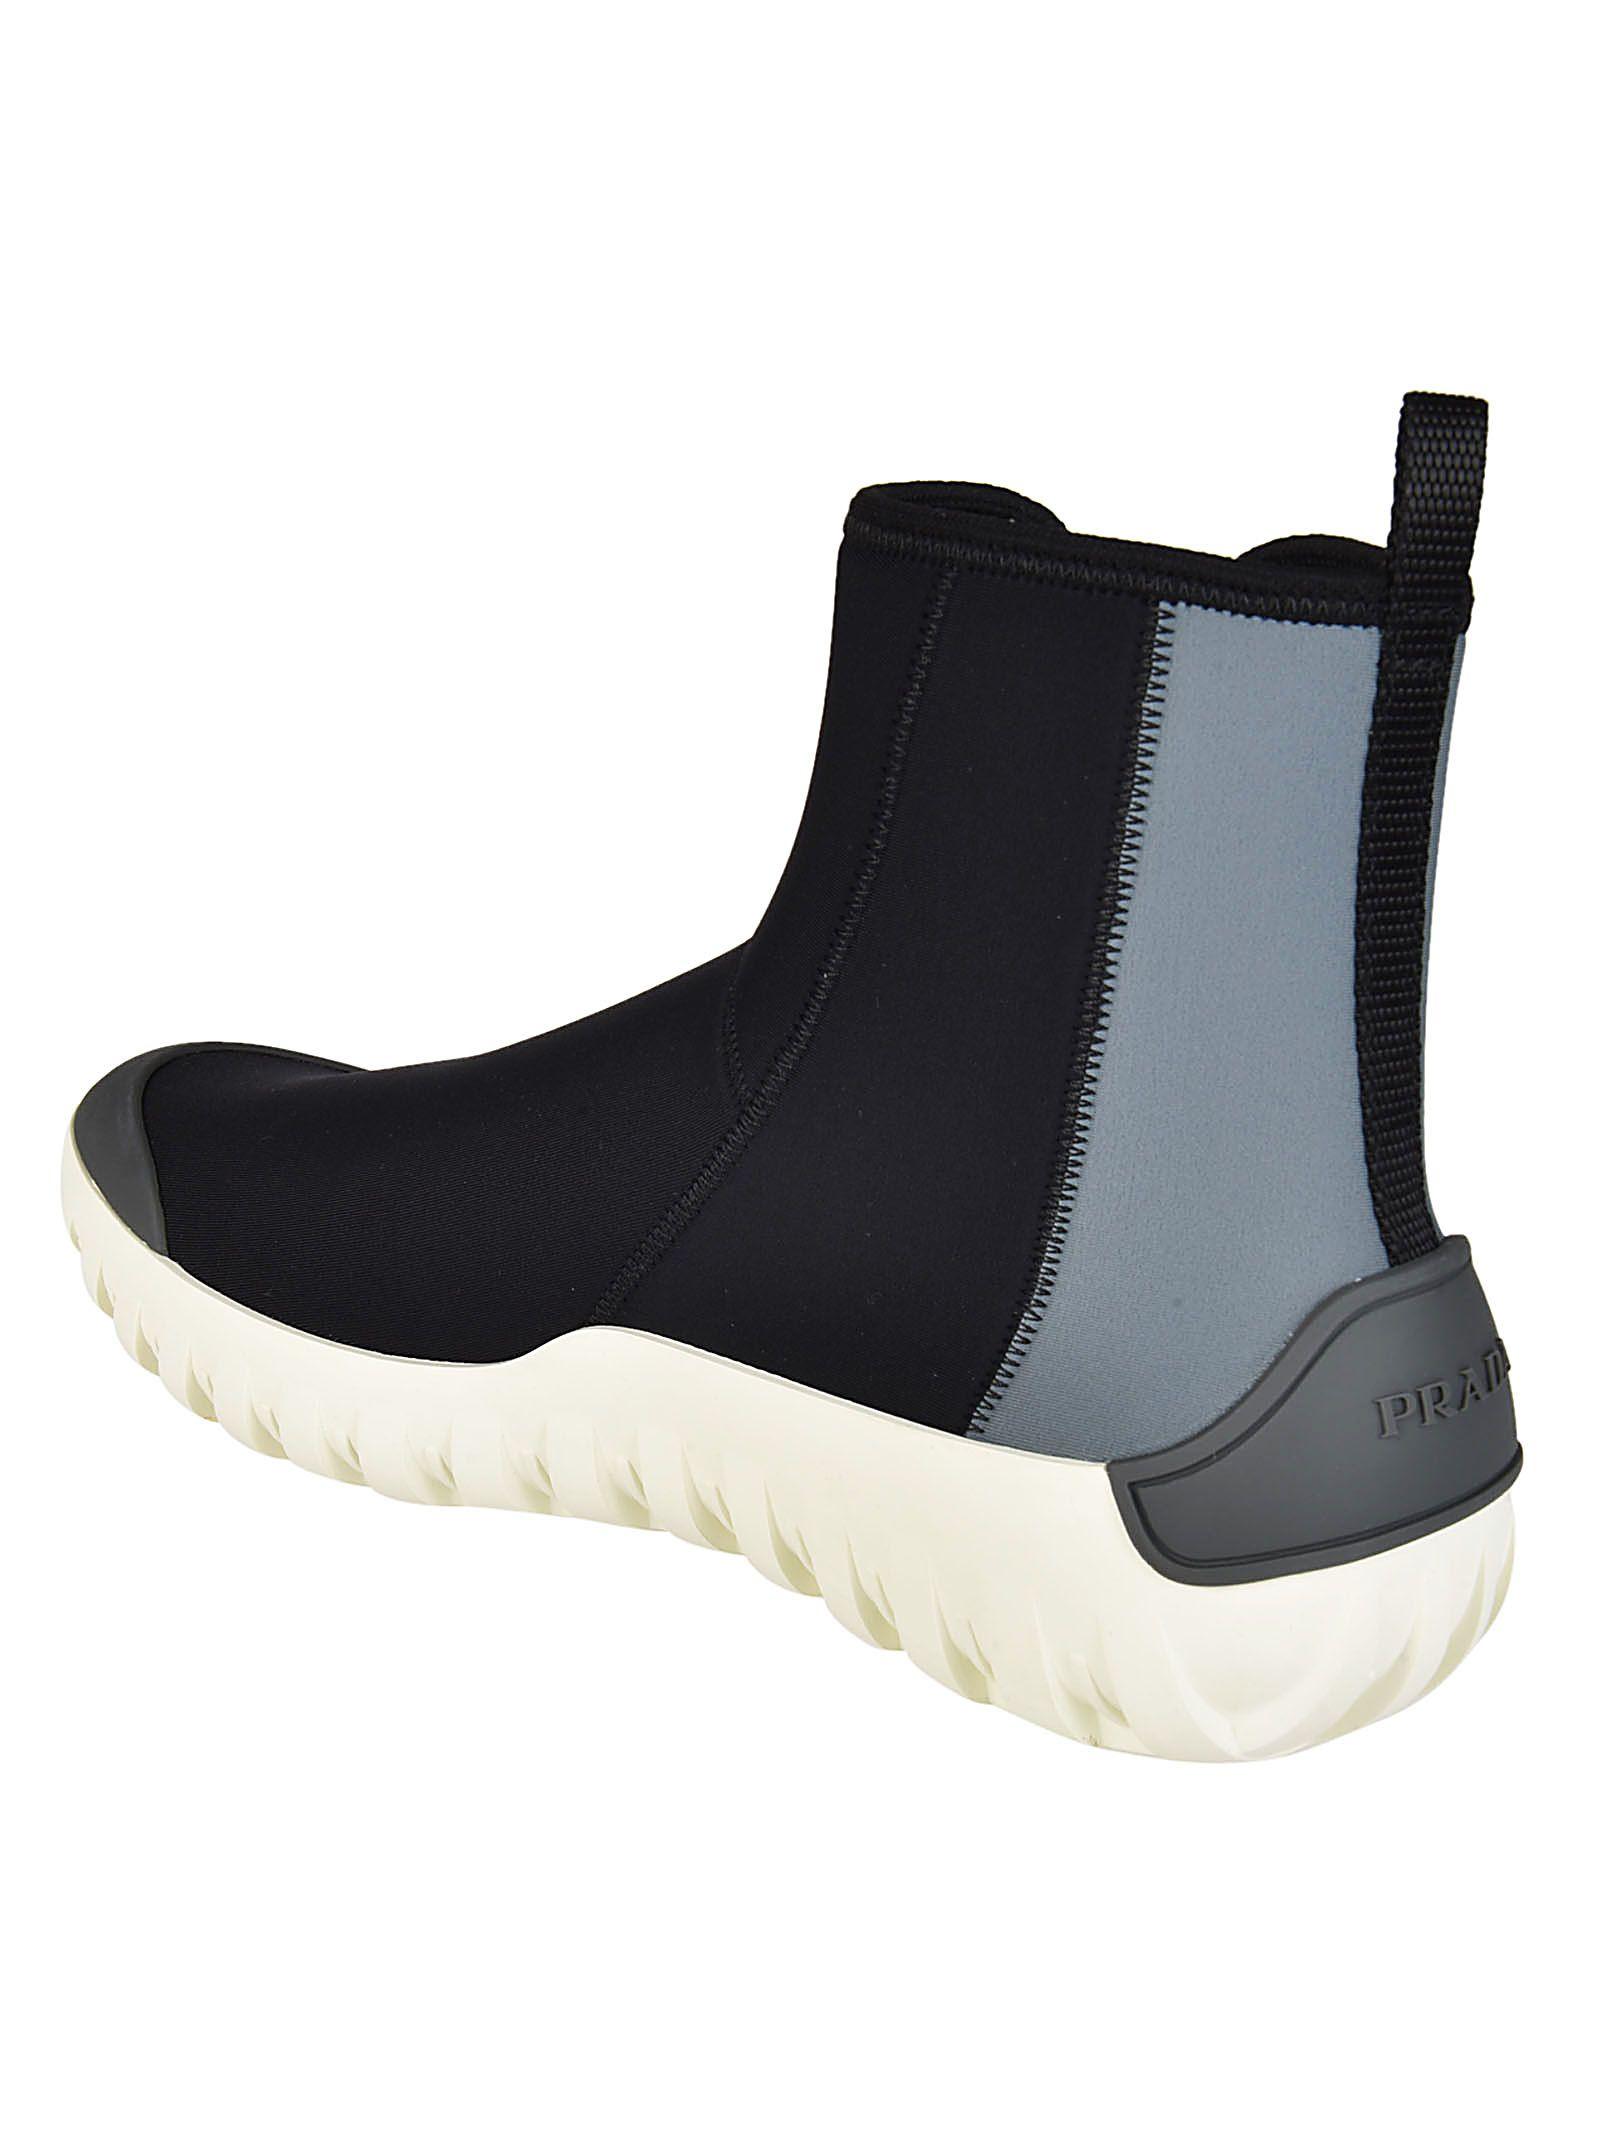 Scuba Sneakers Spring/summer Prada 2S9Ko